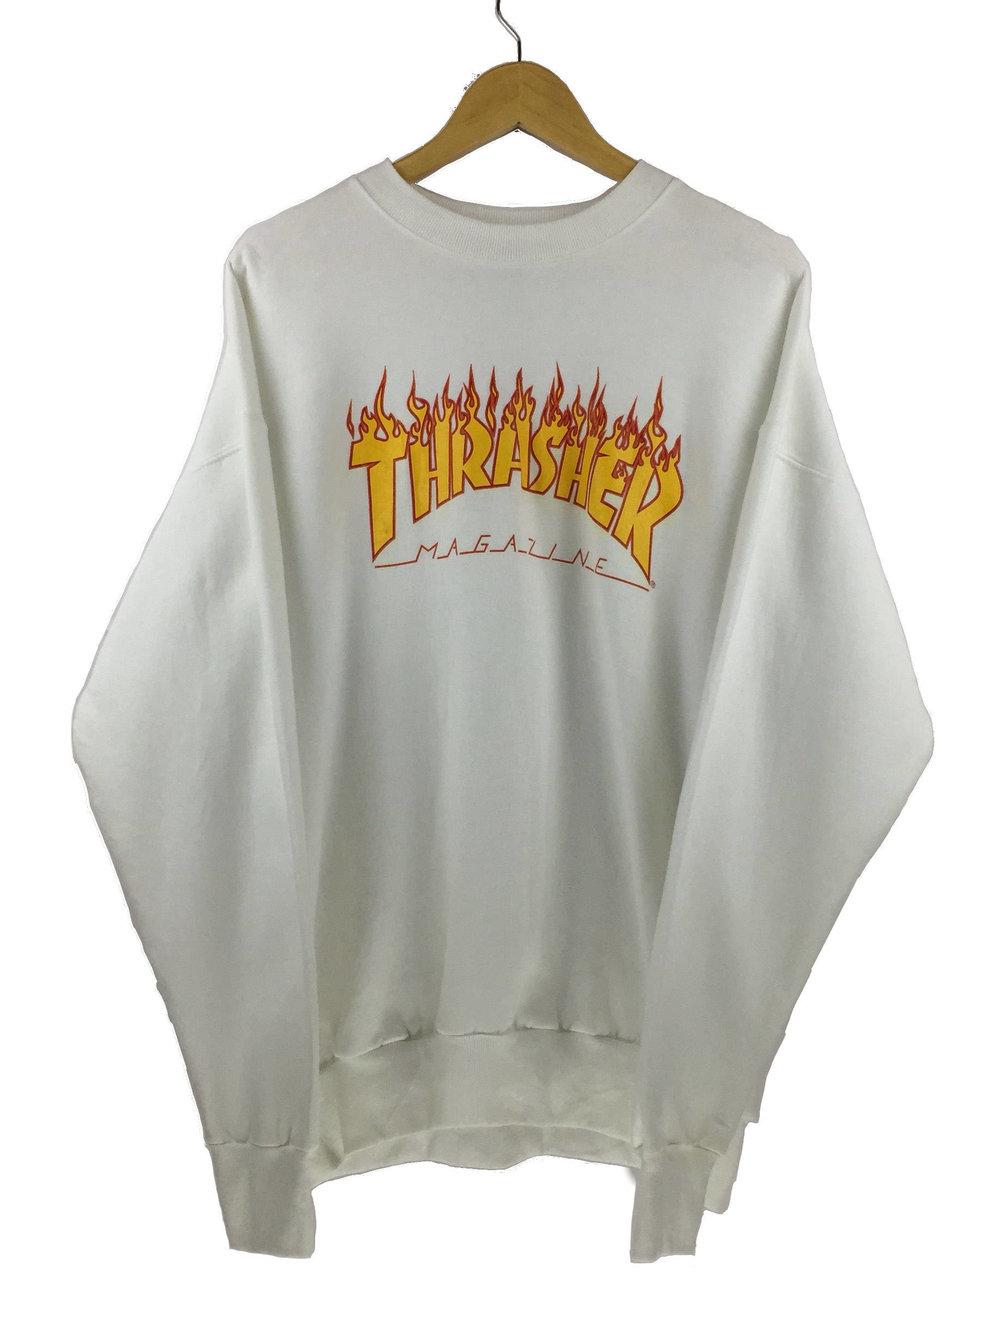 White 90s Thrasher Magazine Sweater from MY East Coast Hut